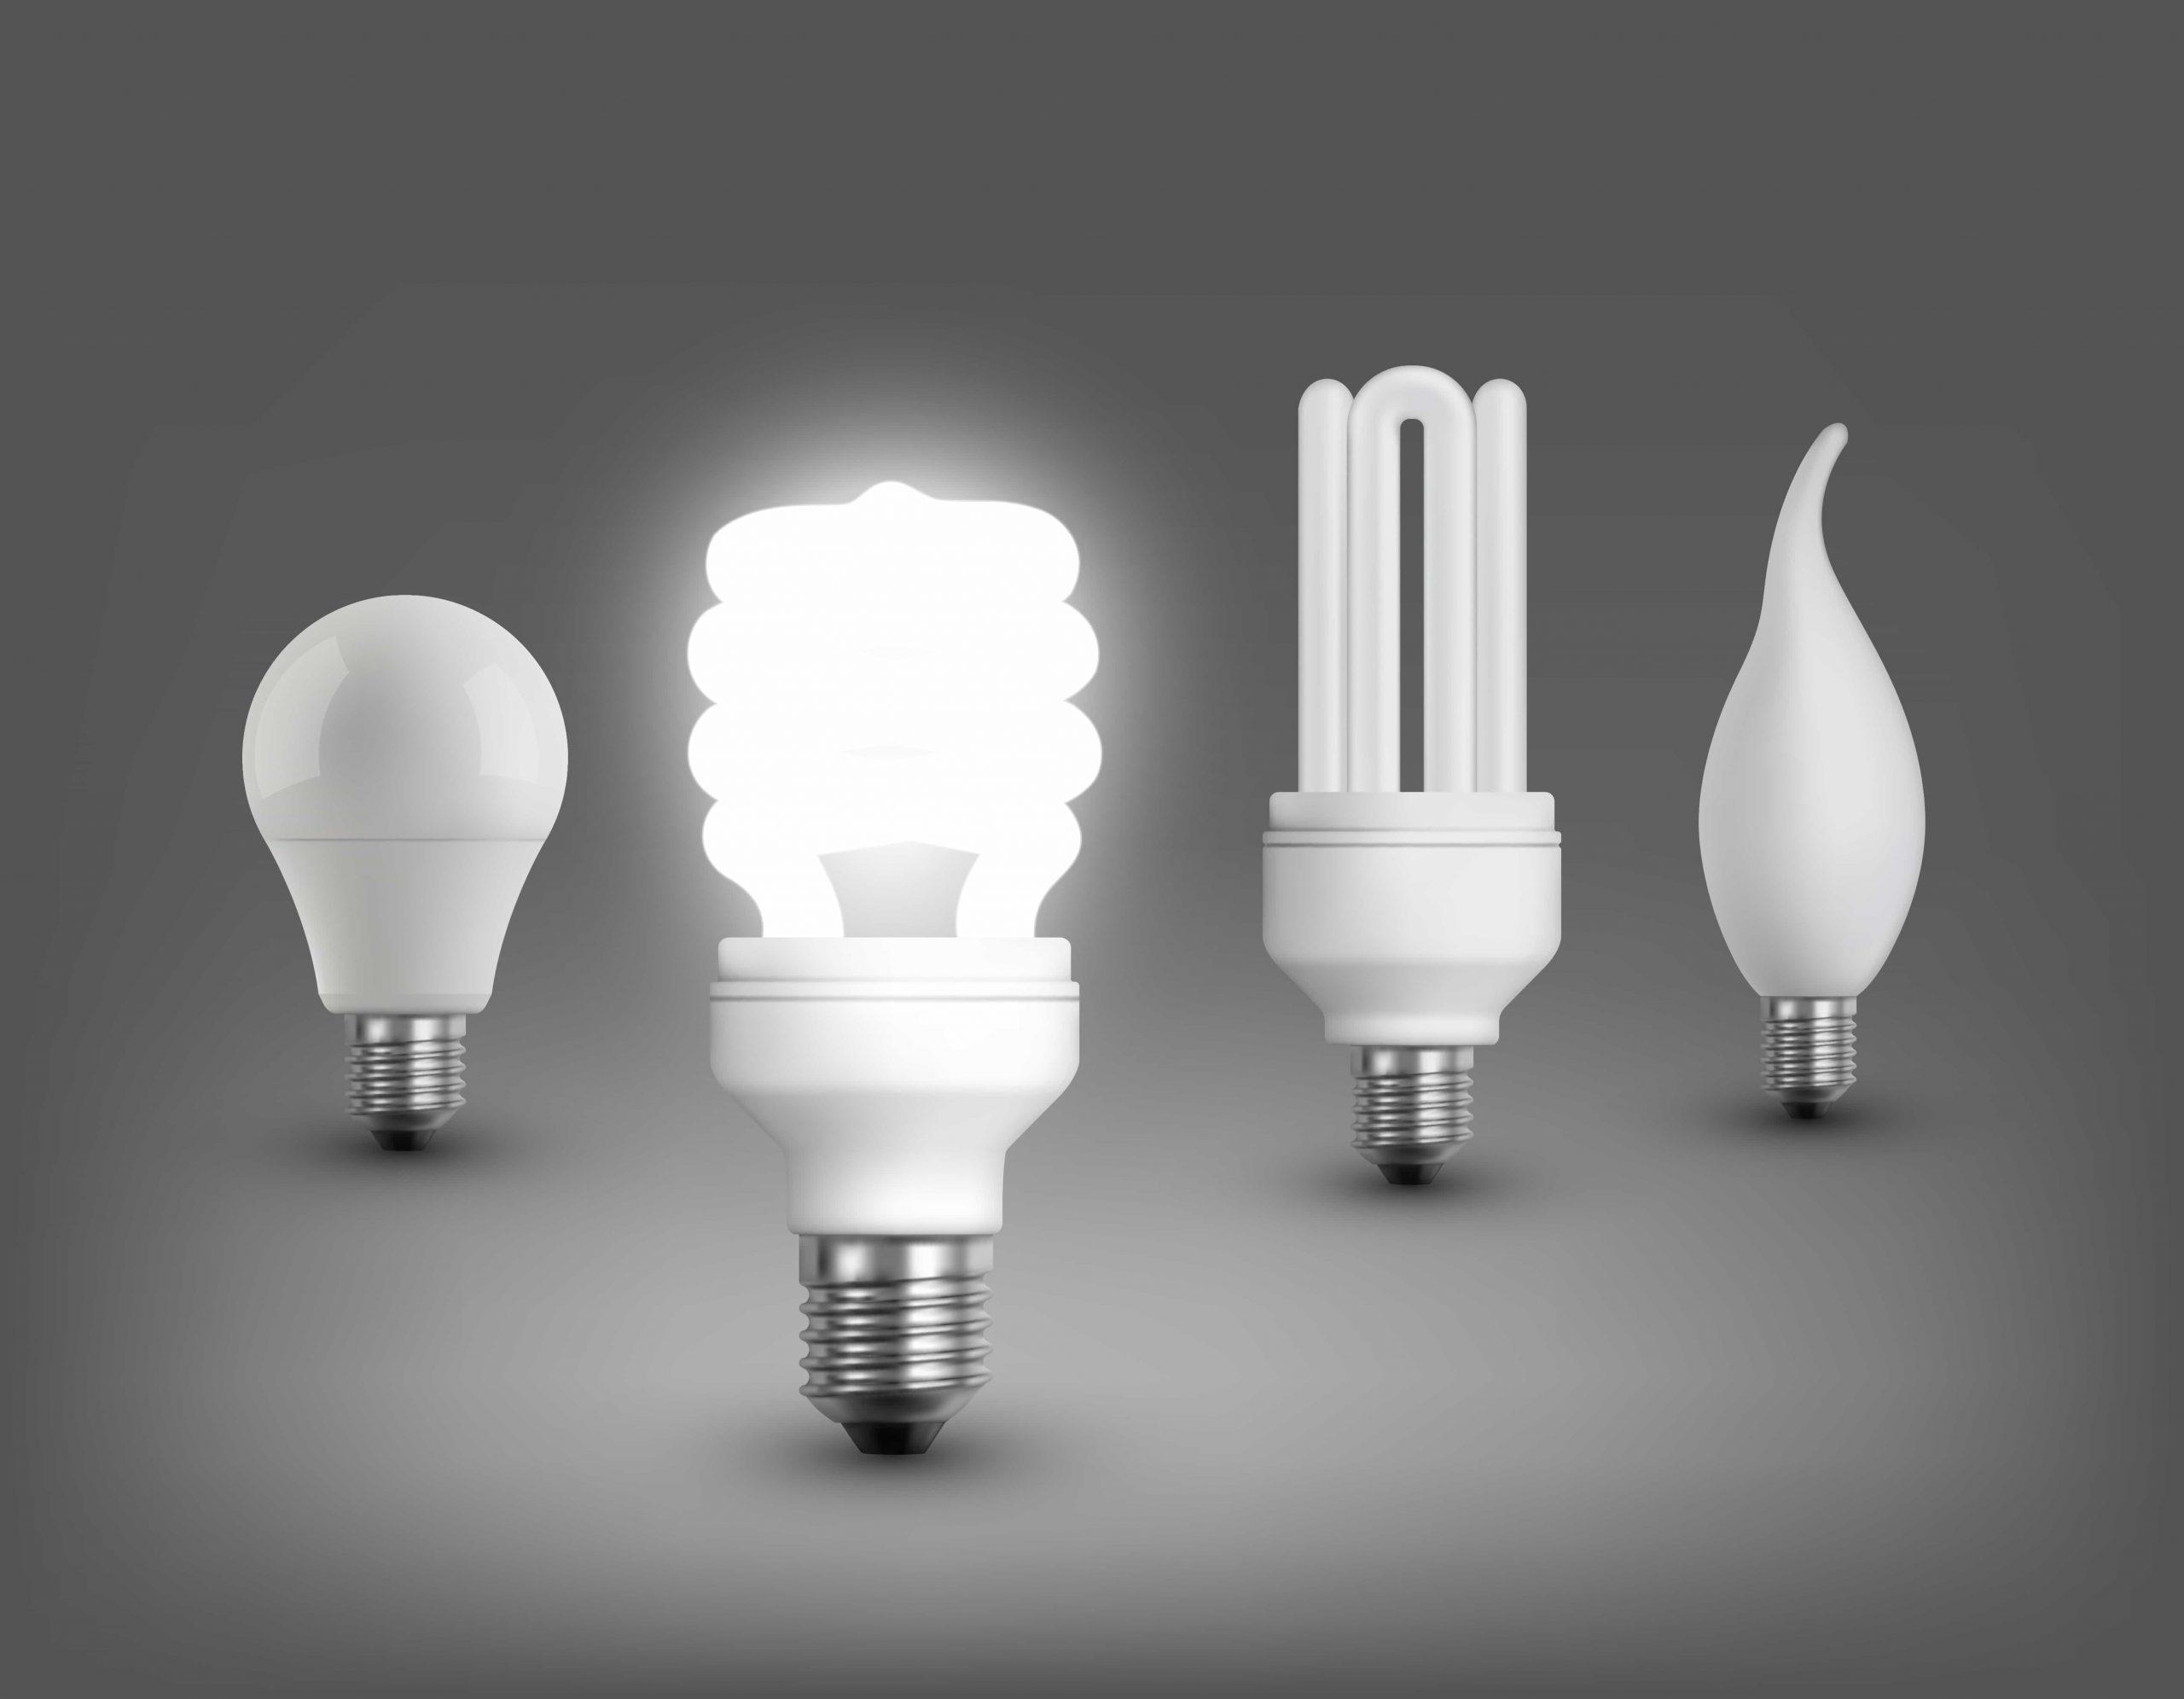 Luces LED modernas encendidas